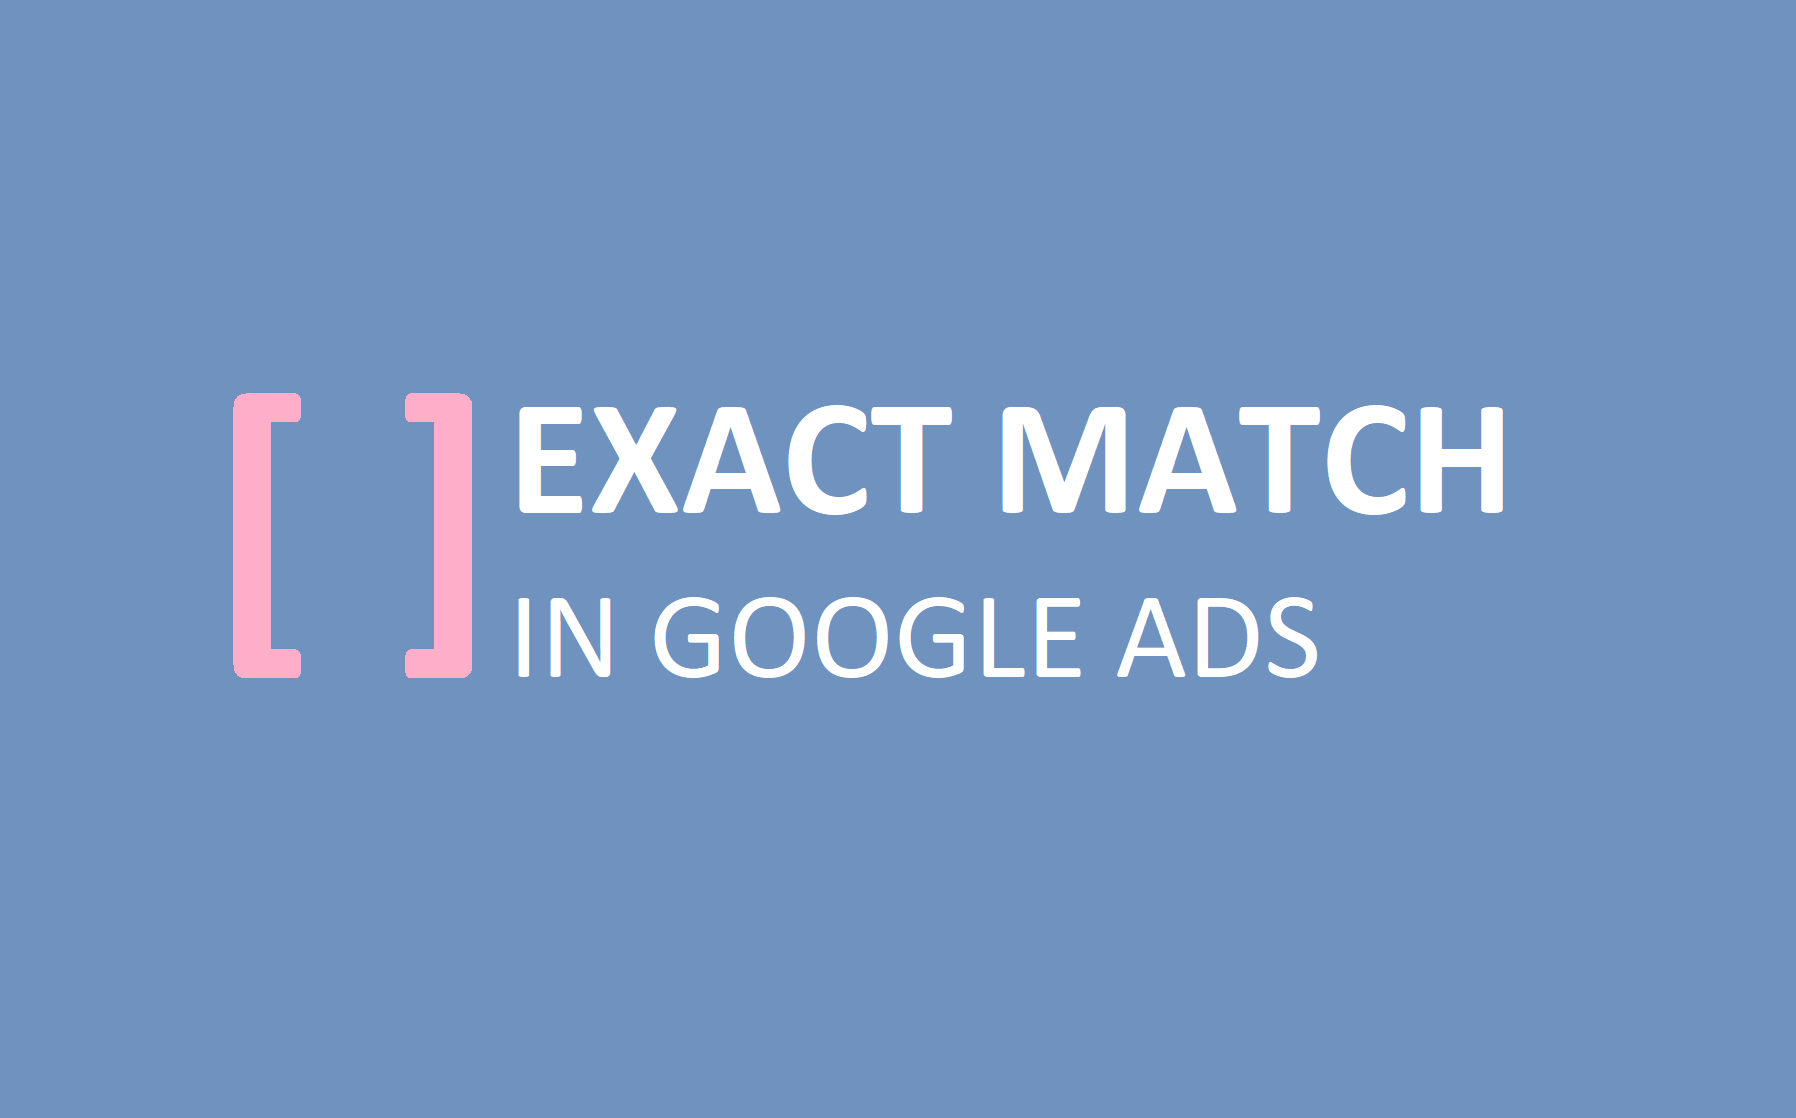 Google Search Exact Match